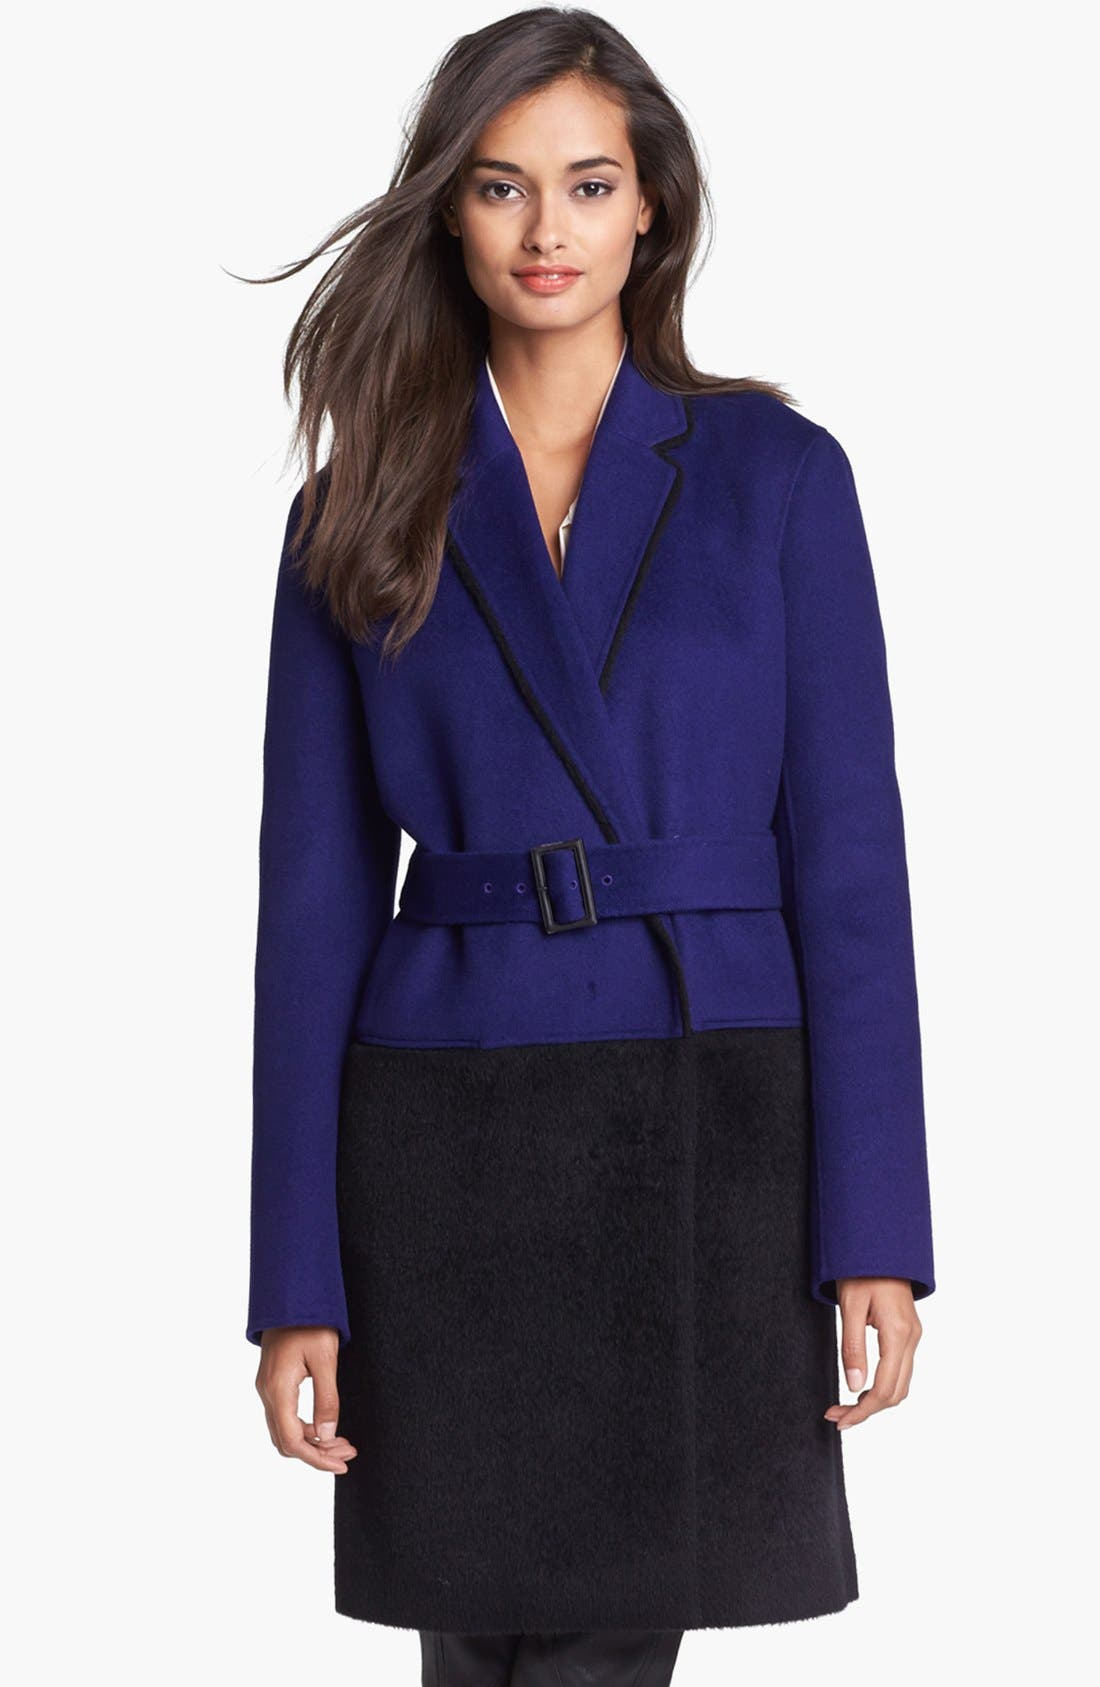 Alternate Image 1 Selected - Diane von Furstenberg 'Logan' Colorblock Overcoat